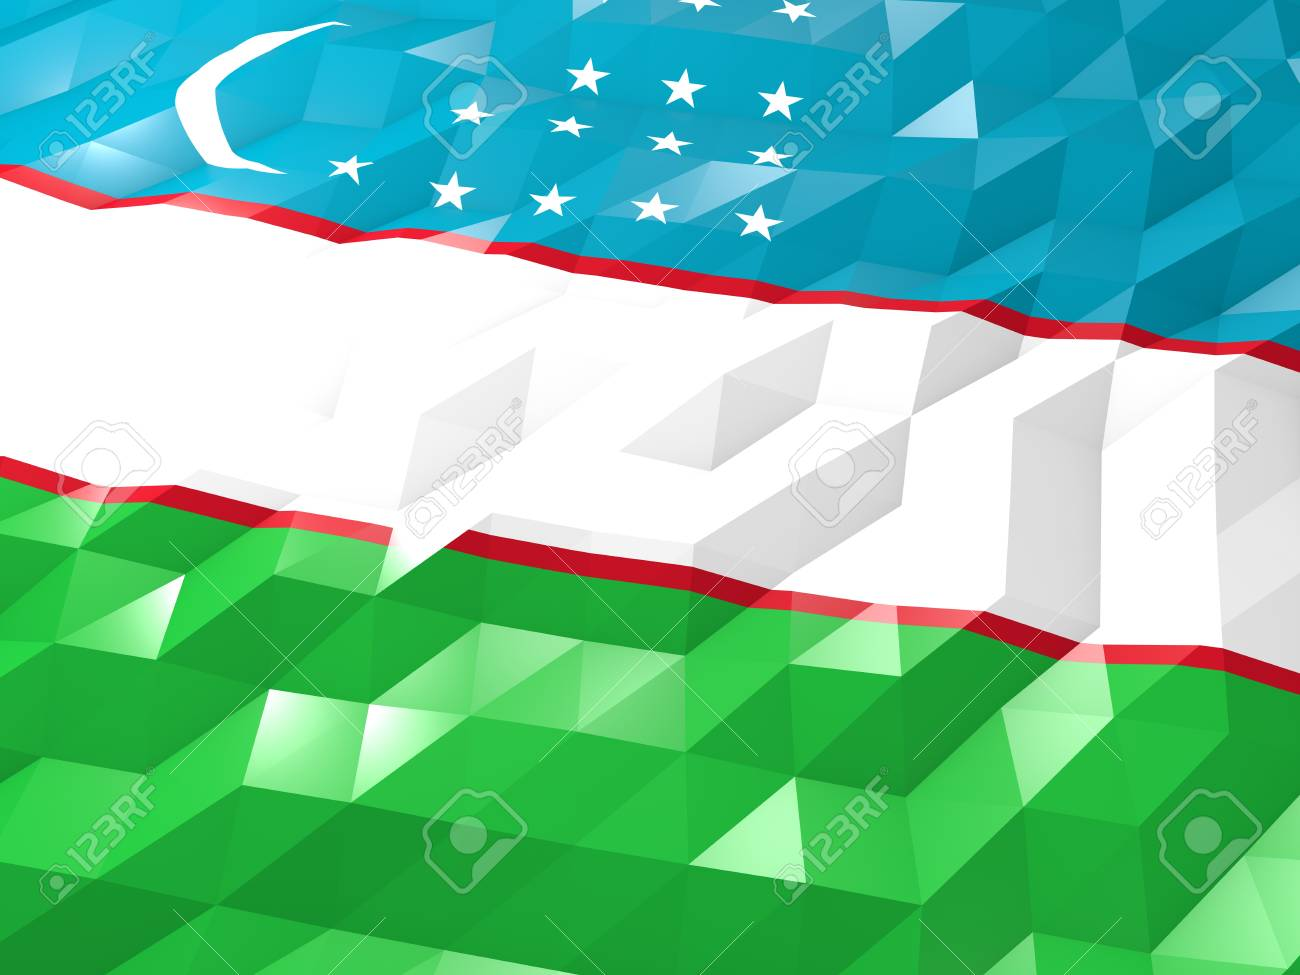 Flag Of Uzbekistan 3D Wallpaper Illustration National Symbol 1300x975